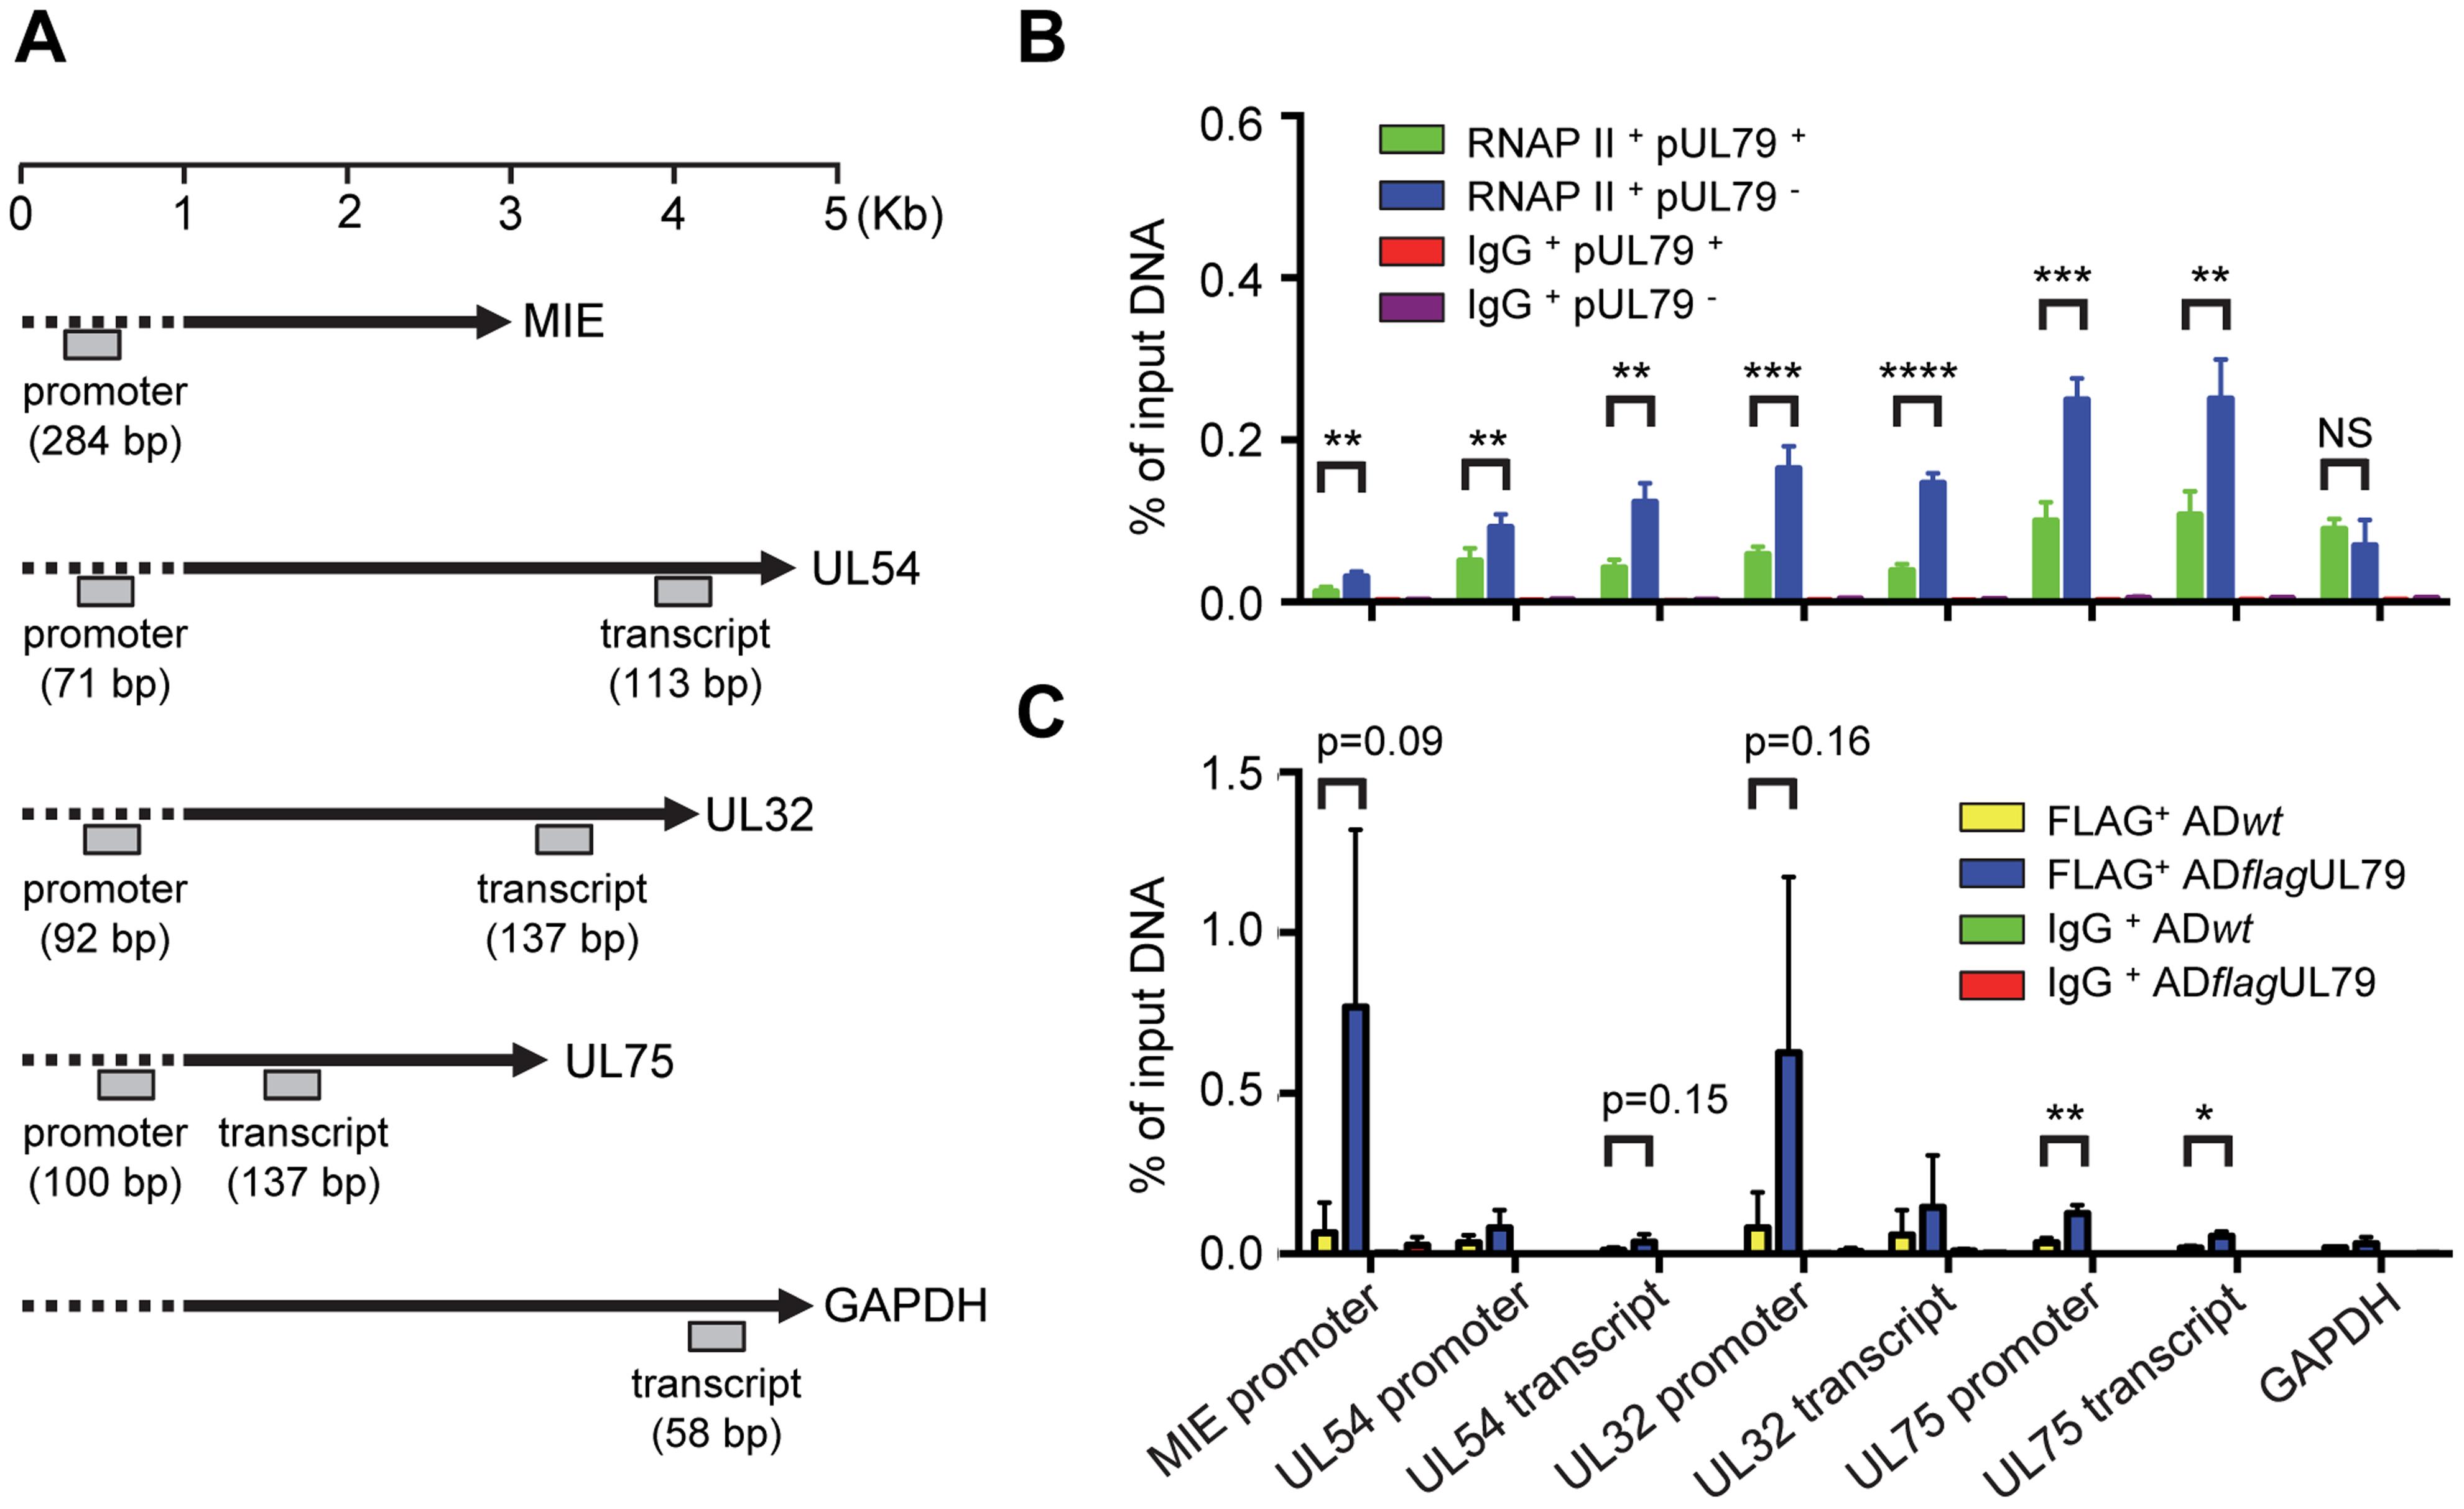 pUL79 alters RNAP II occupancy at viral loci.